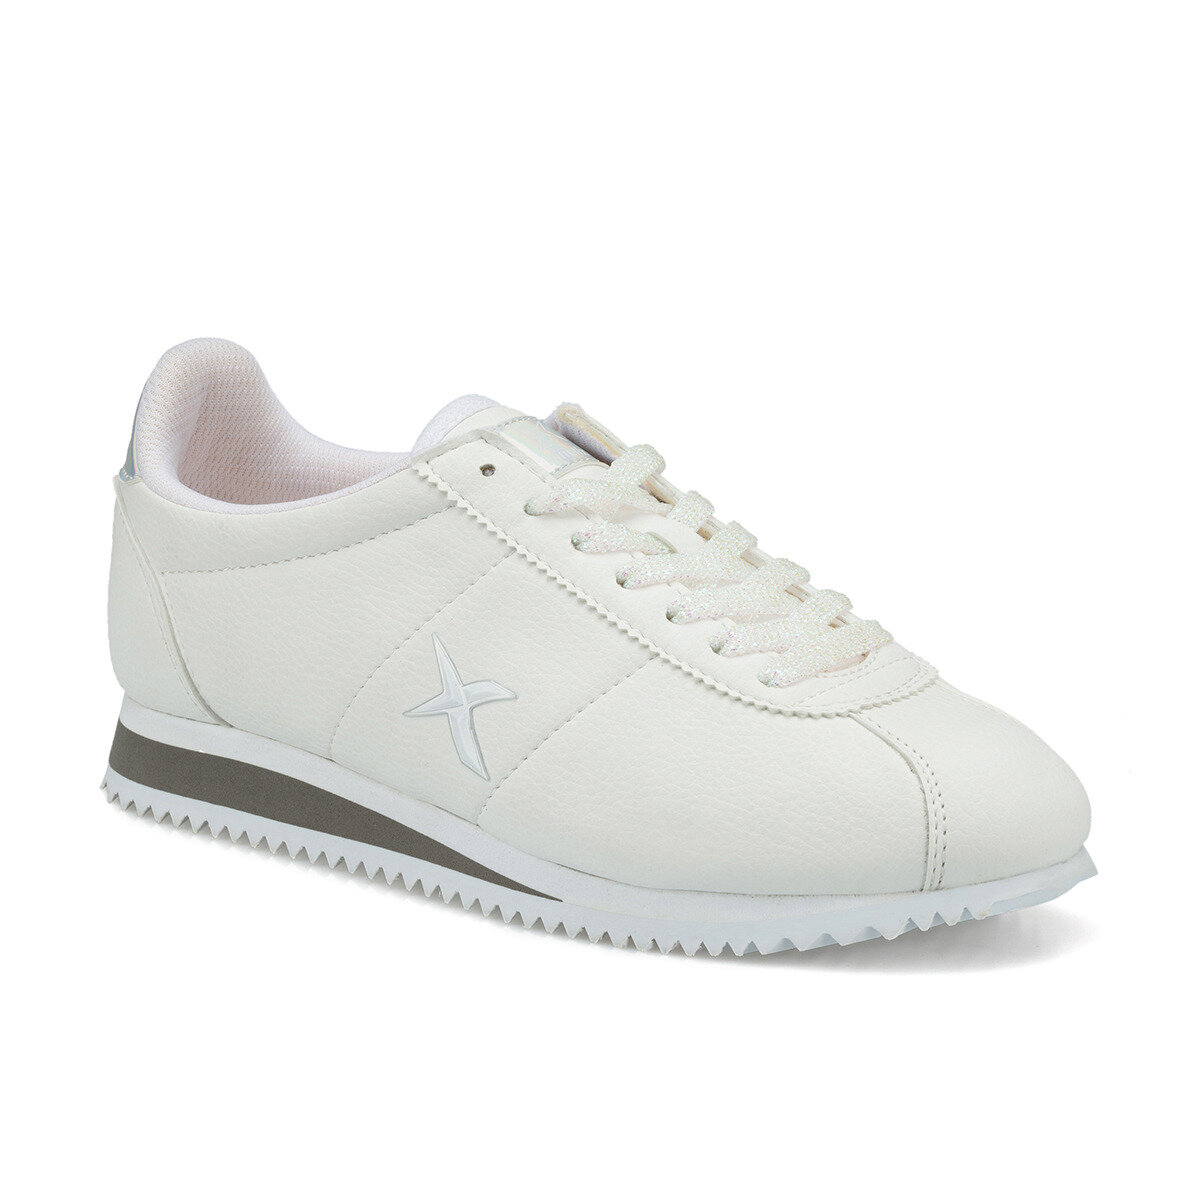 FLO GIGA W White Women 'S Sneaker Shoes KINETIX